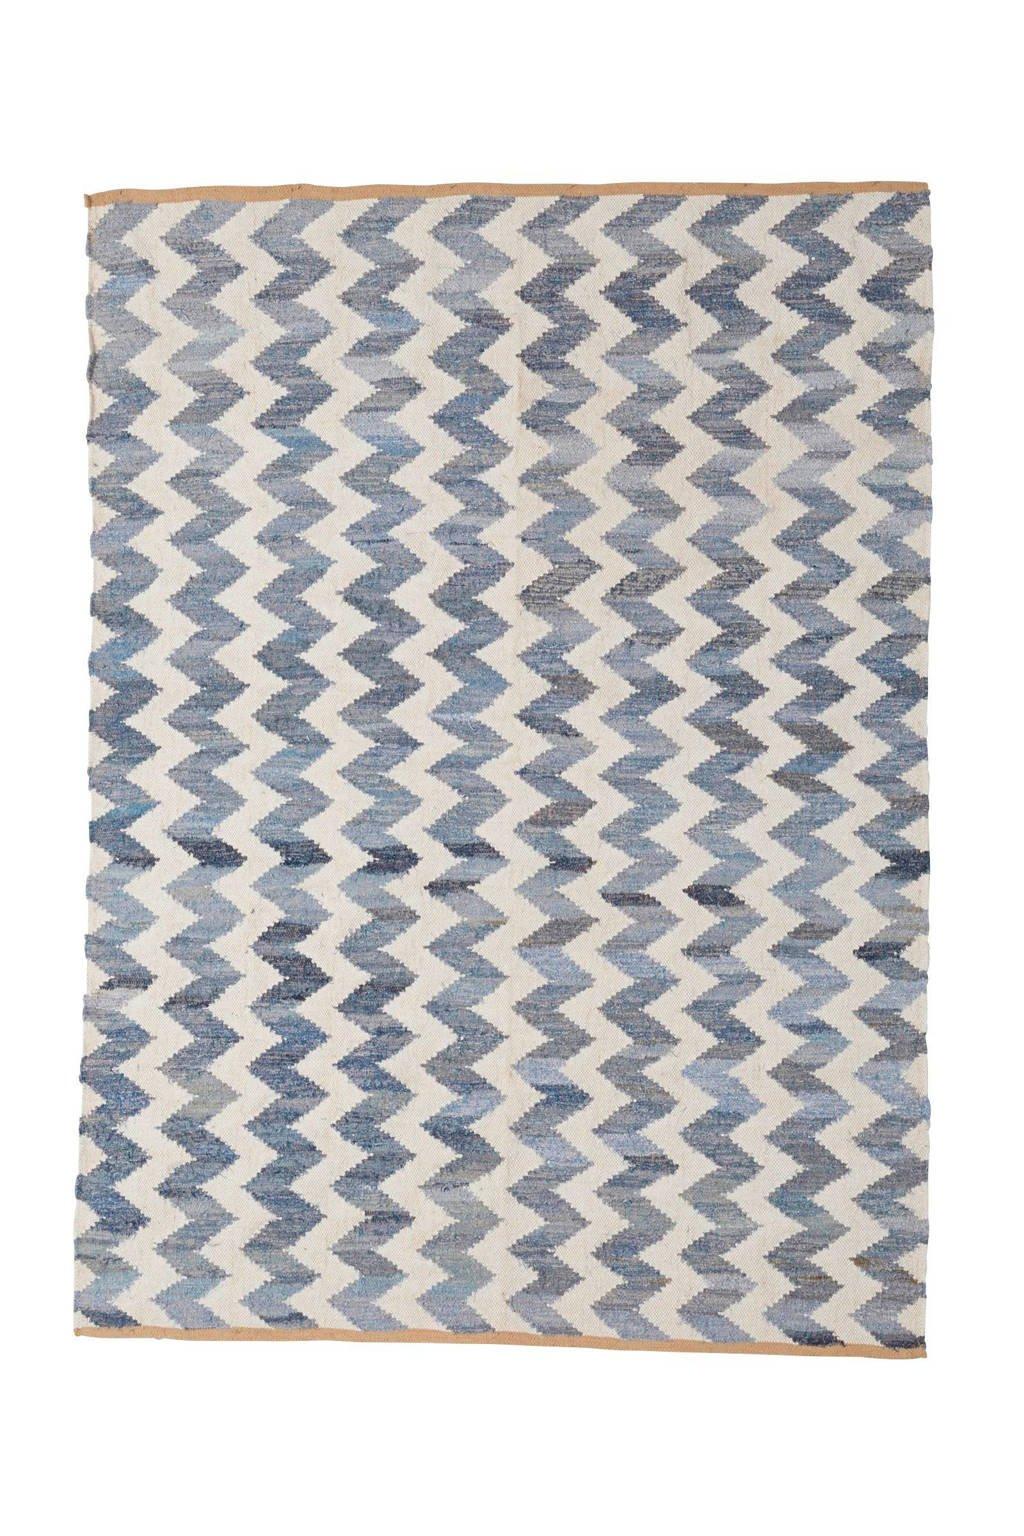 whkmp's own Vloerkleed  (230x160 cm), Denim/wit